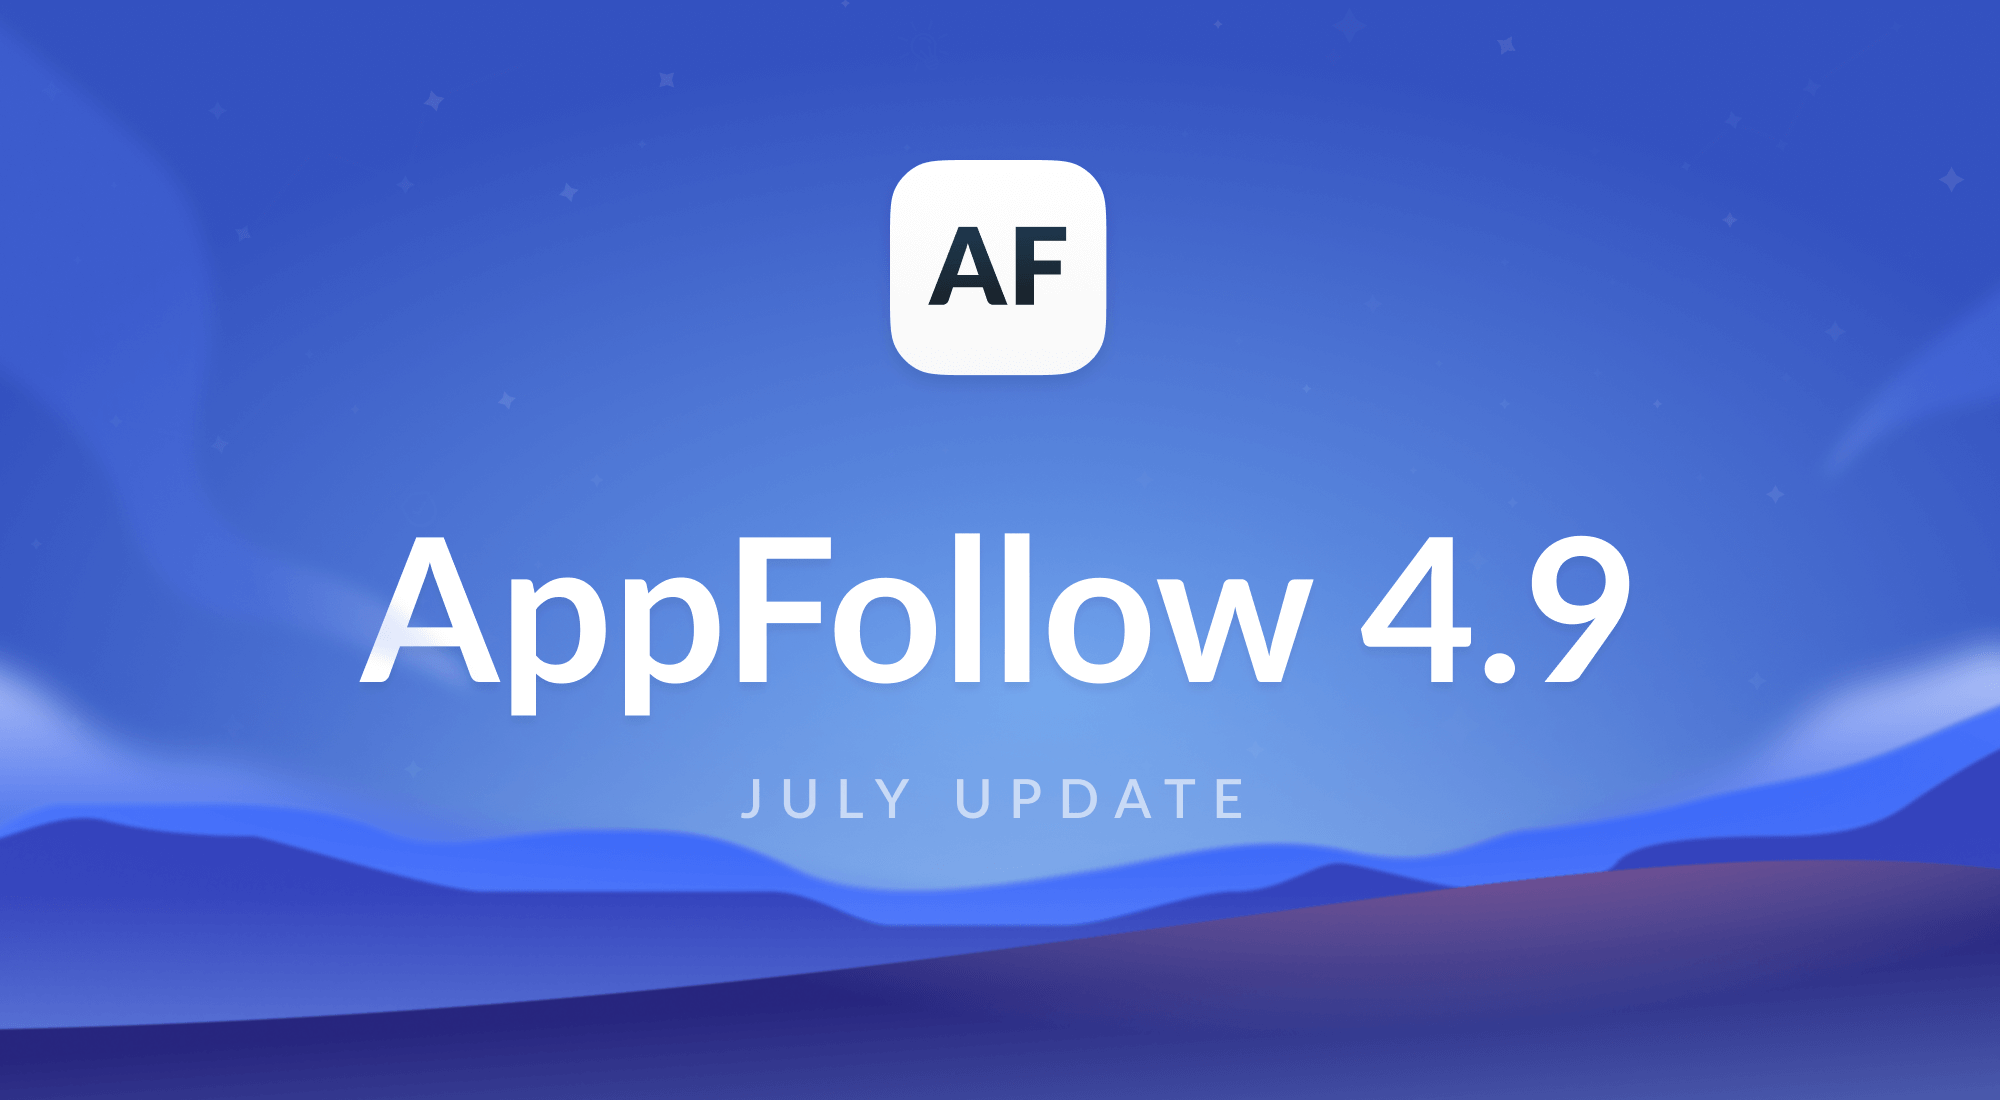 4.9 July Update